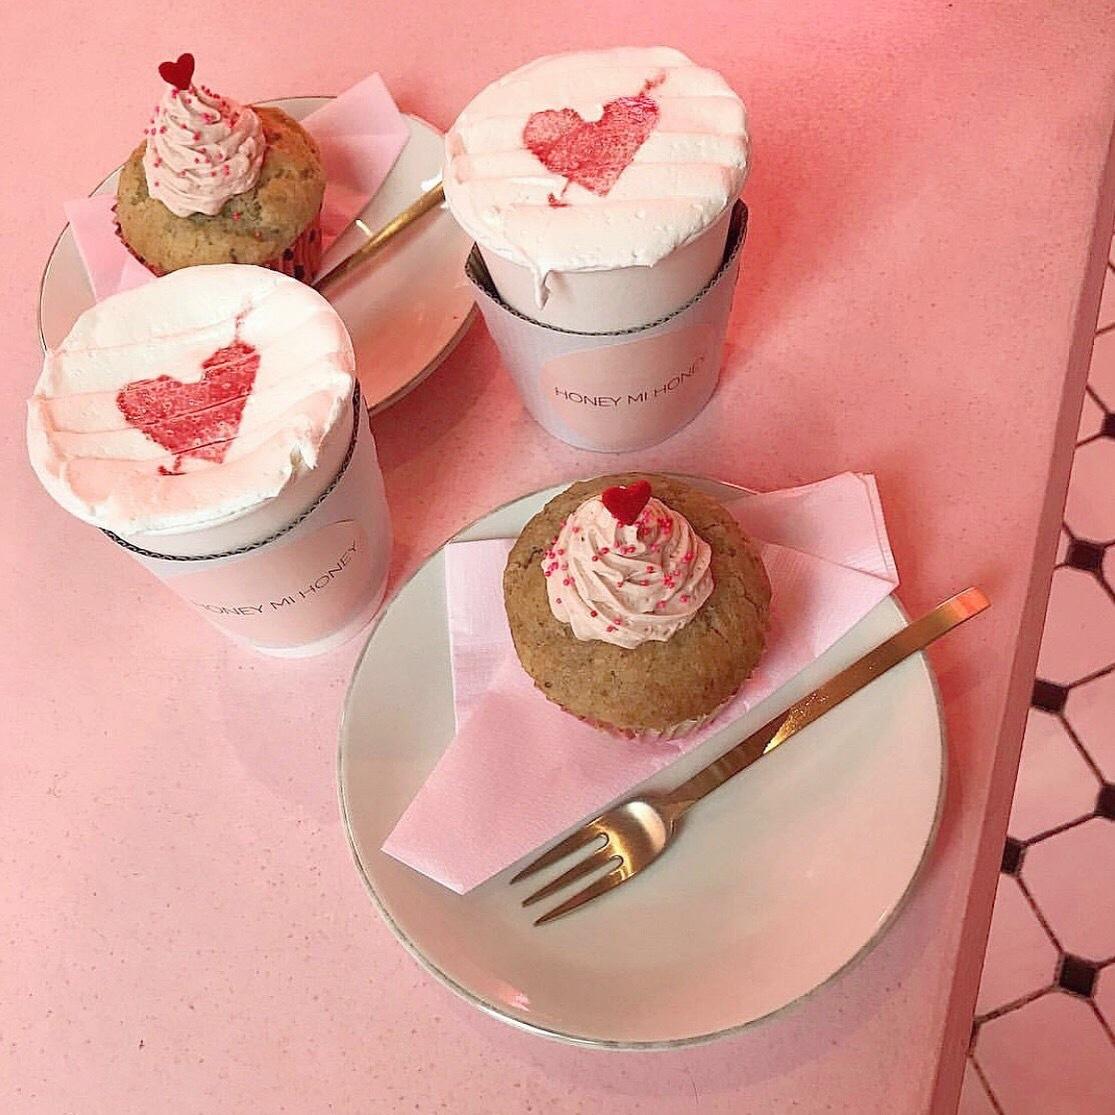 Vol.43♡ CAFE HONEY MI HONEYの《ホワイトデー限定メニュー》❤︎_1_2-1